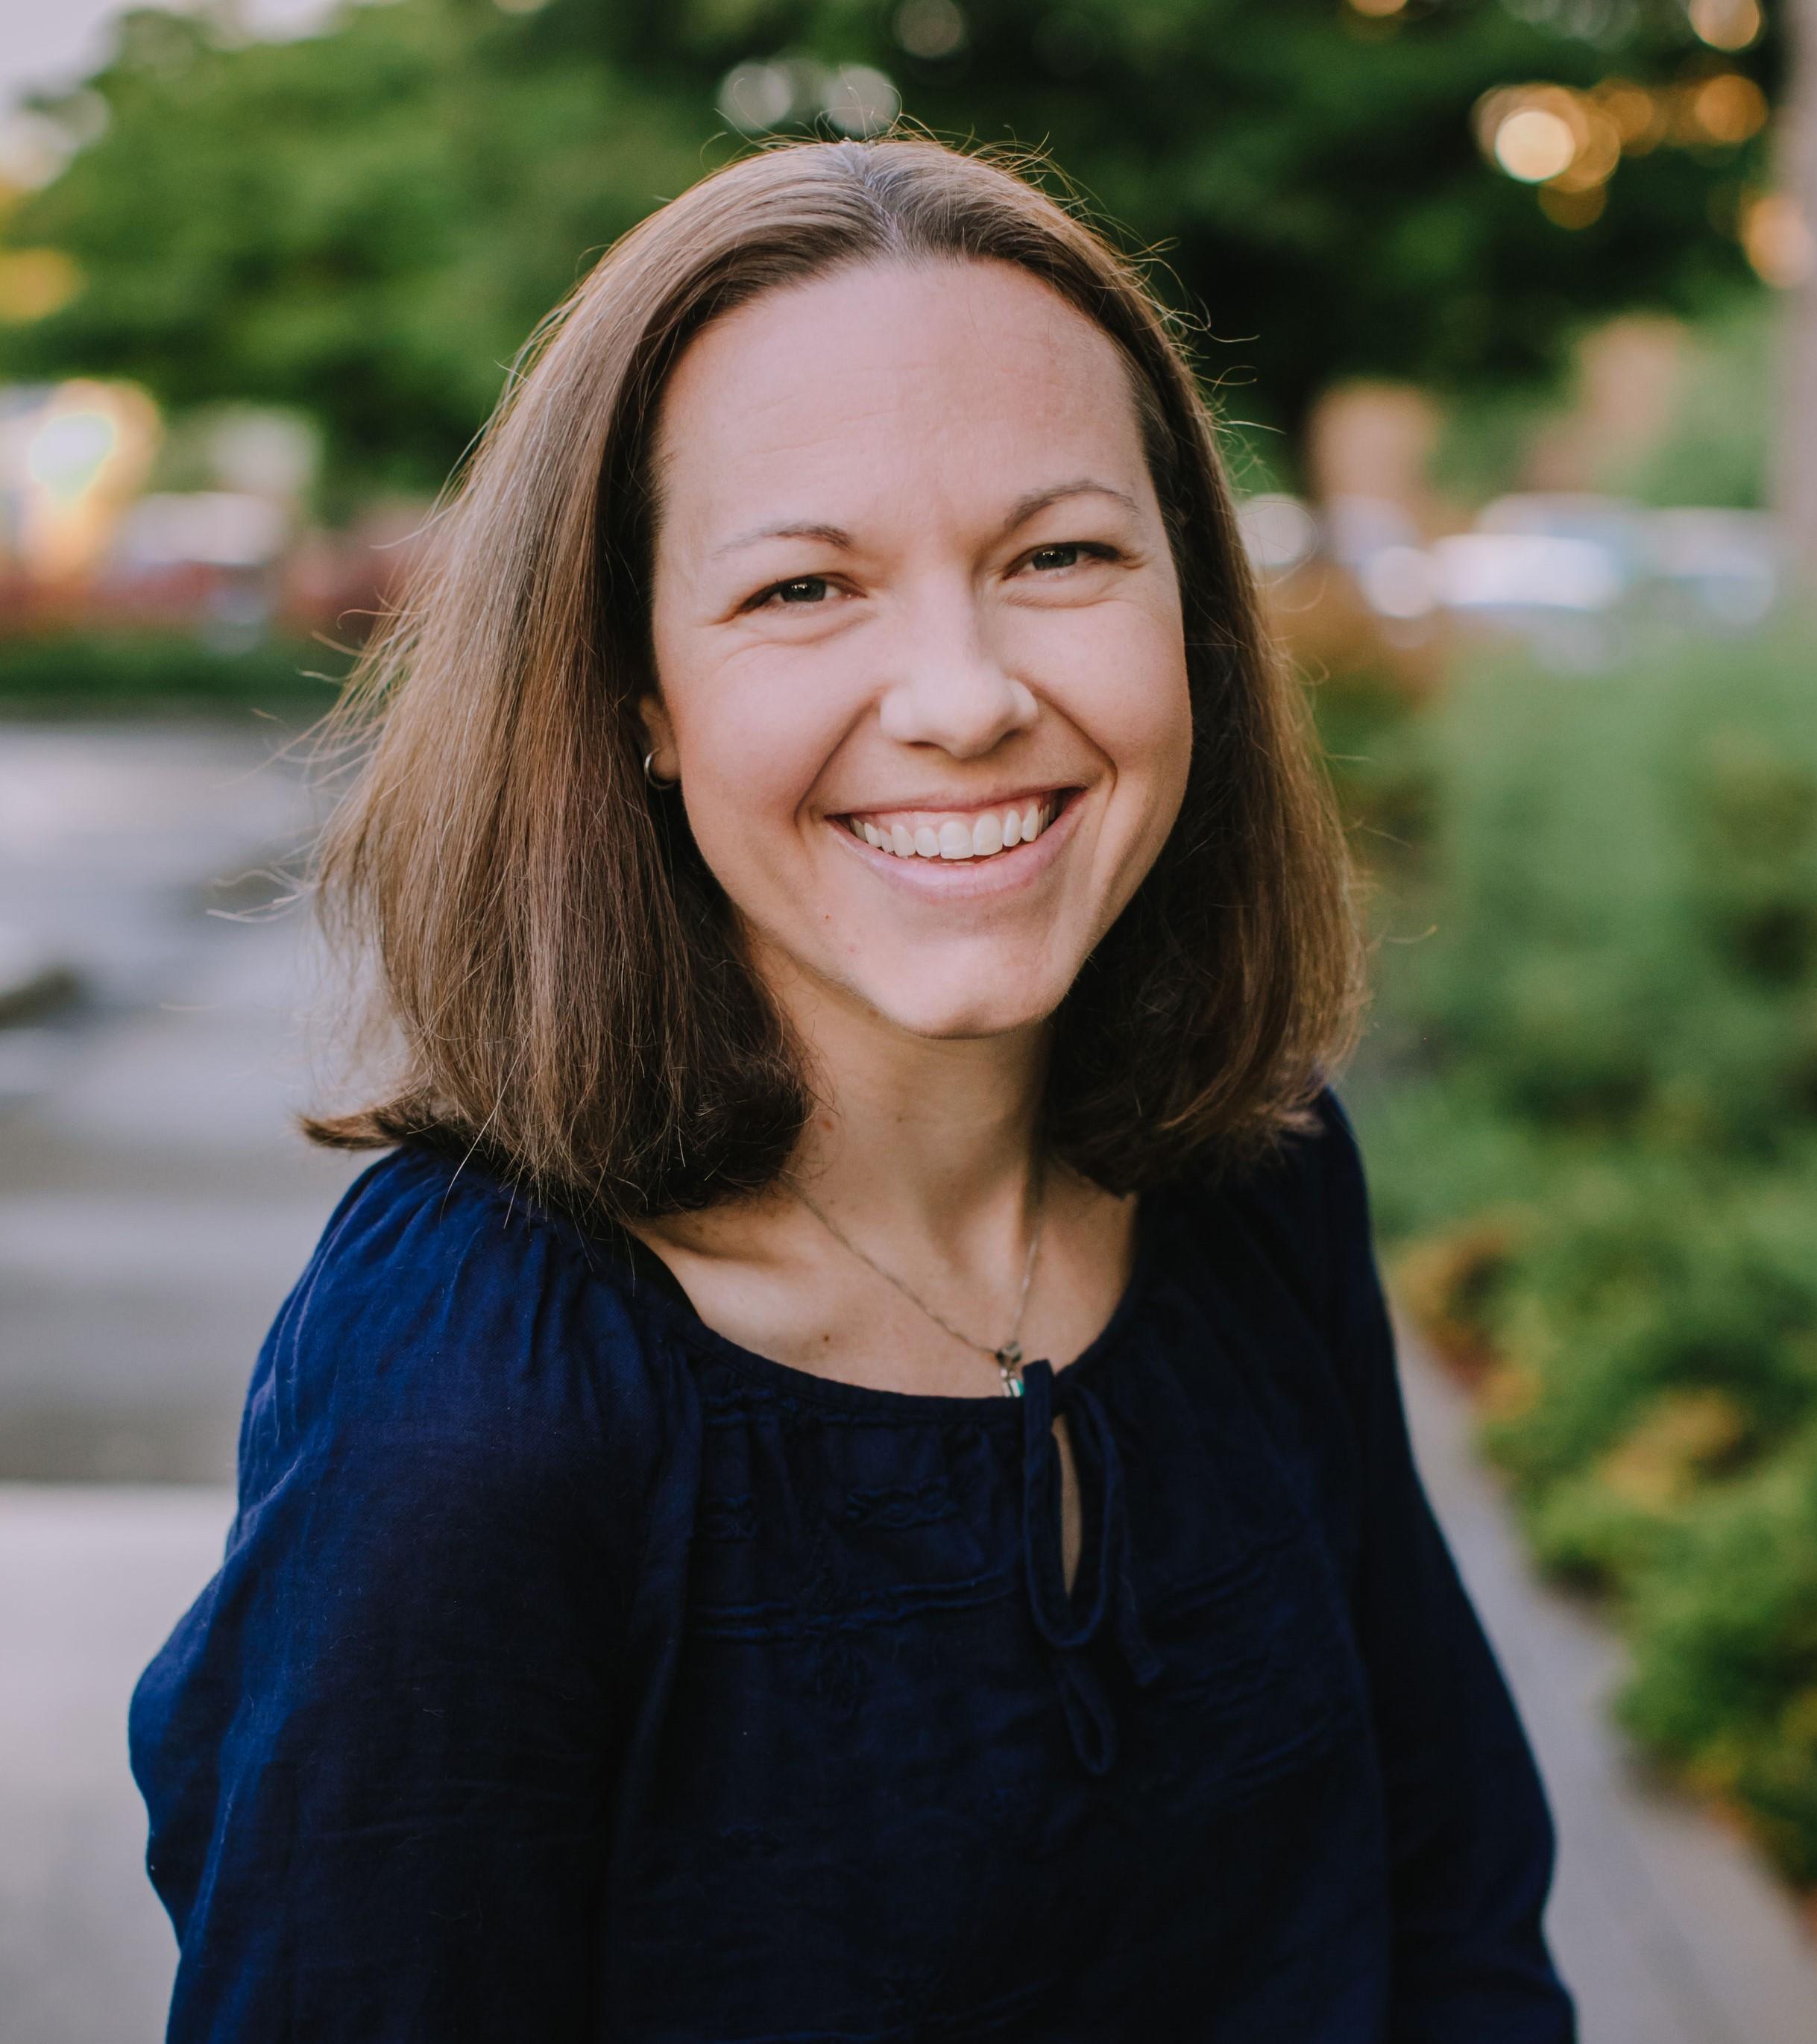 Kristen Hesselbach, PA-C